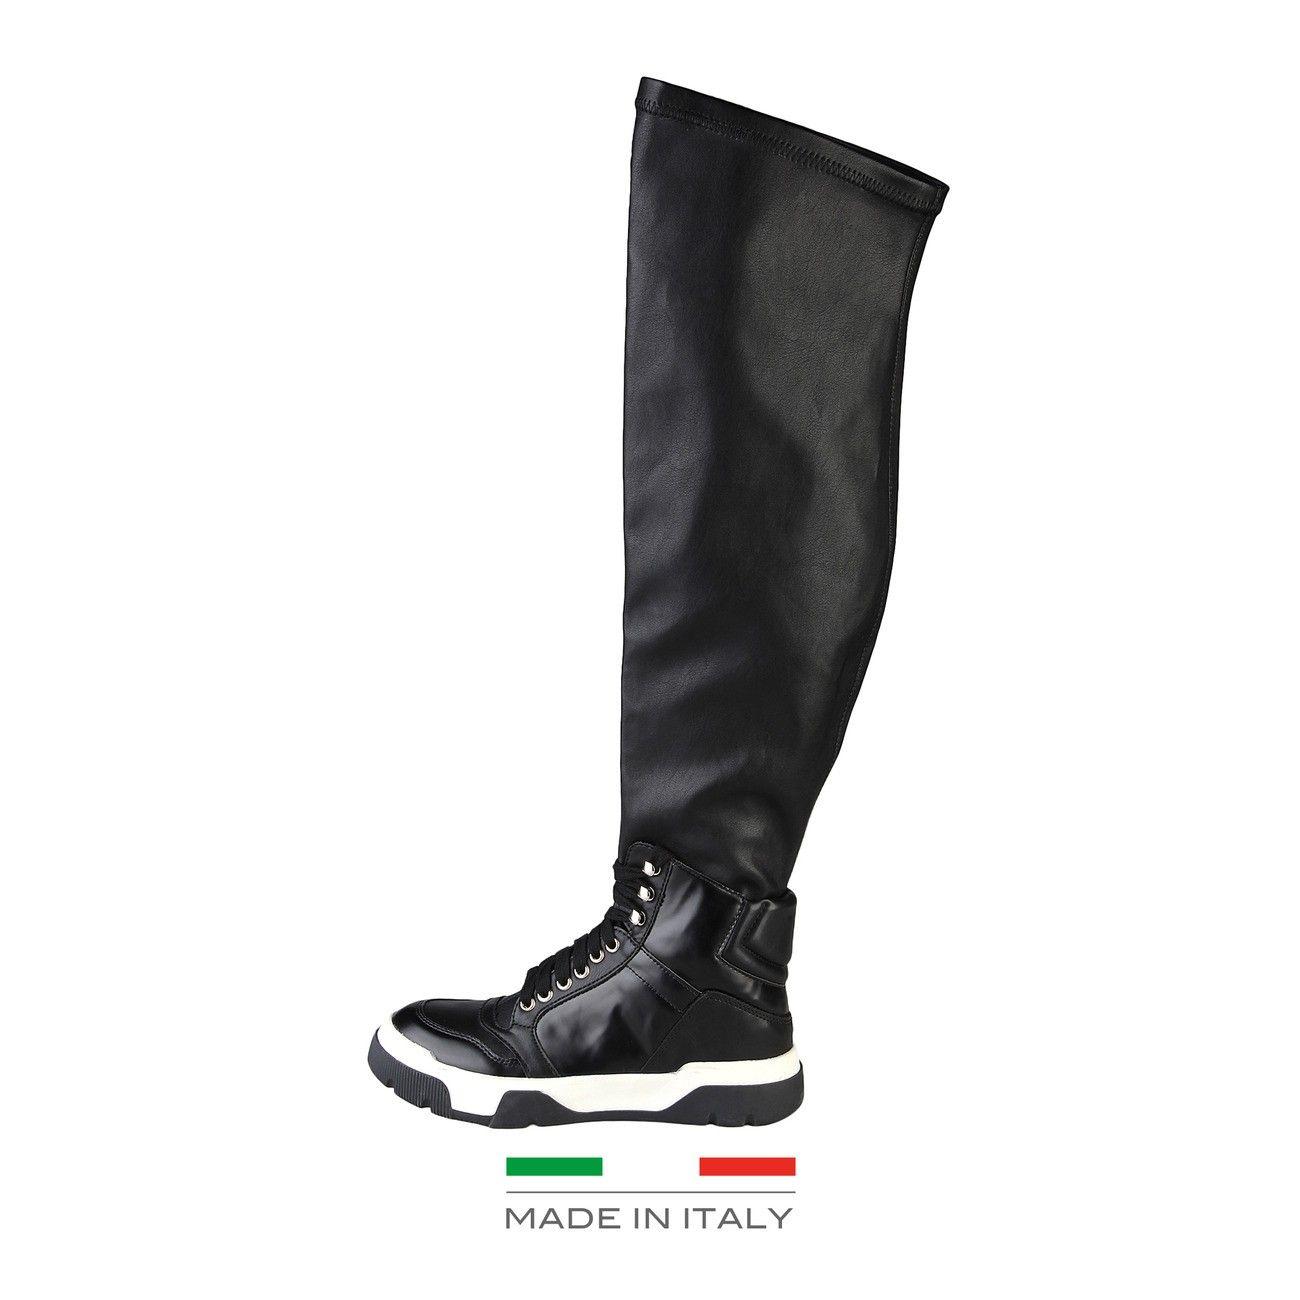 Chaussures Ana Lublin Fashion femme BdbFKgF0